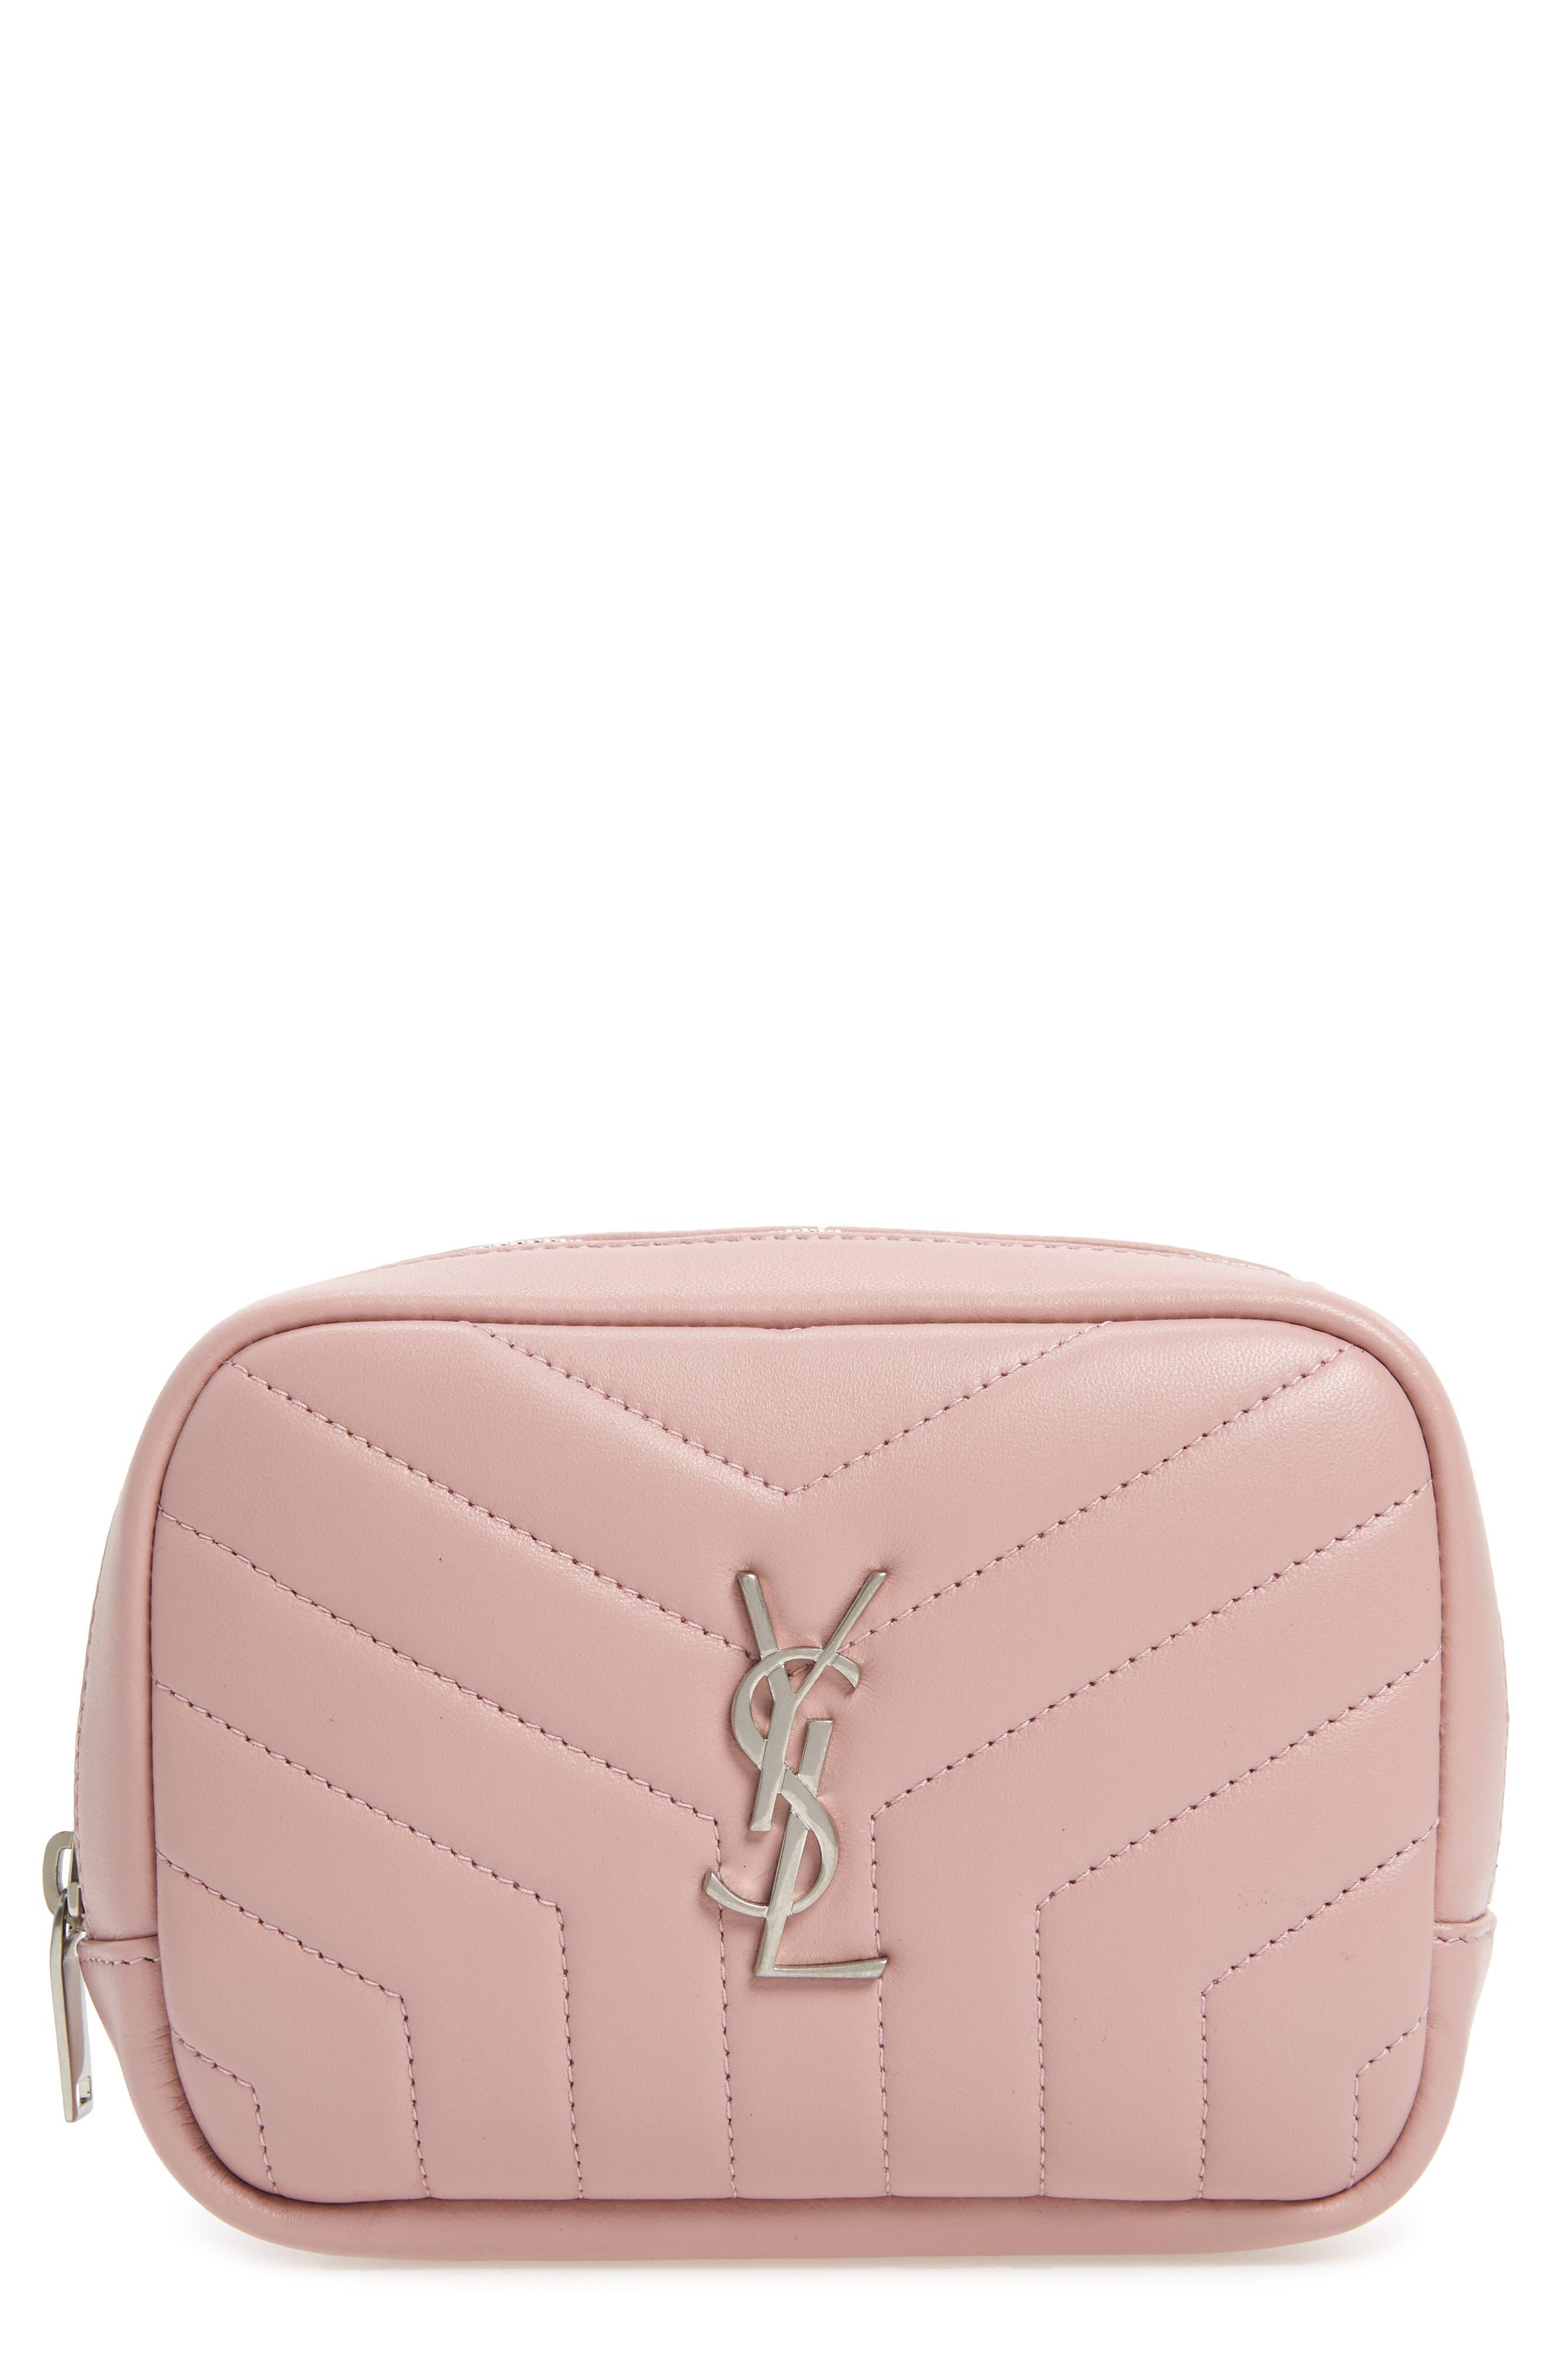 SAINT LAURENT Loulou Matelassé Leather Cosmetics Bag, Main, color, TENDER PINK